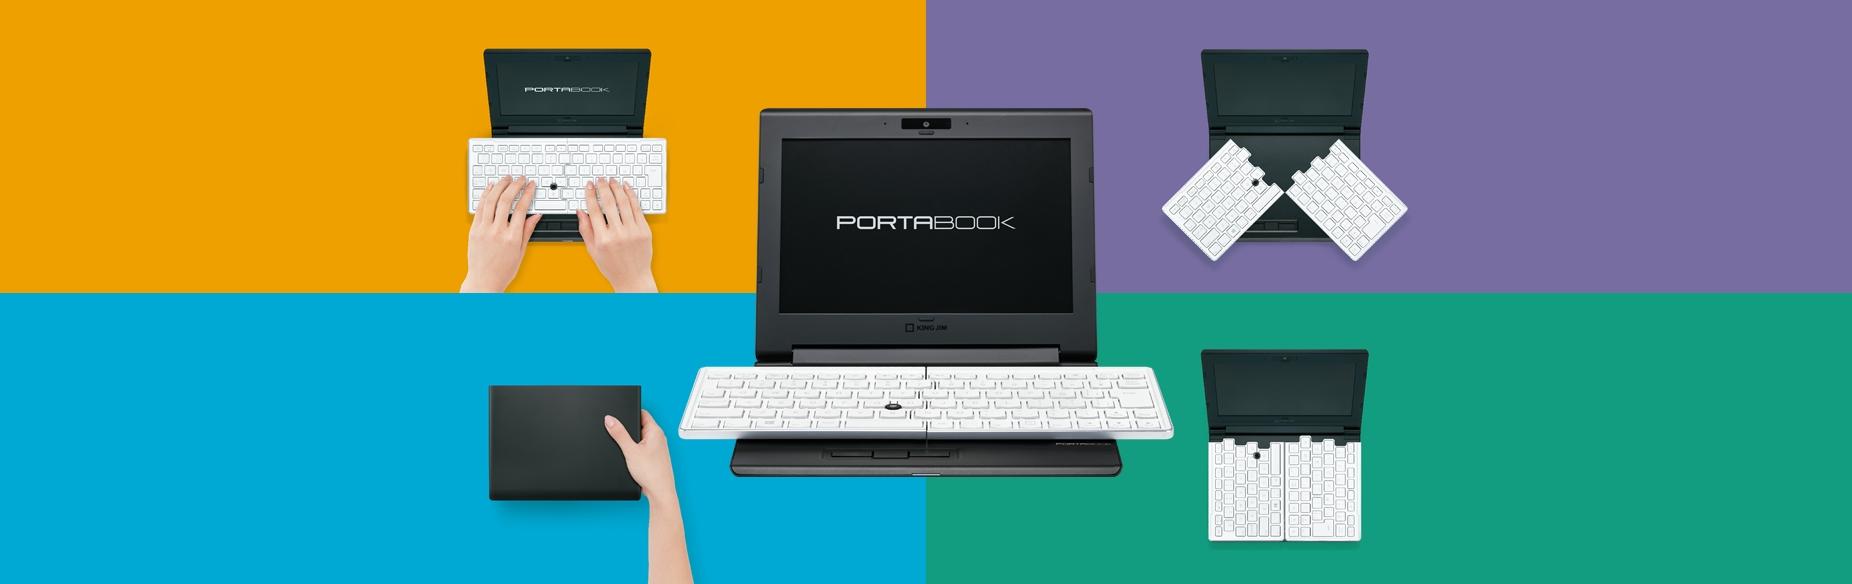 ultrabook portabool xmc10